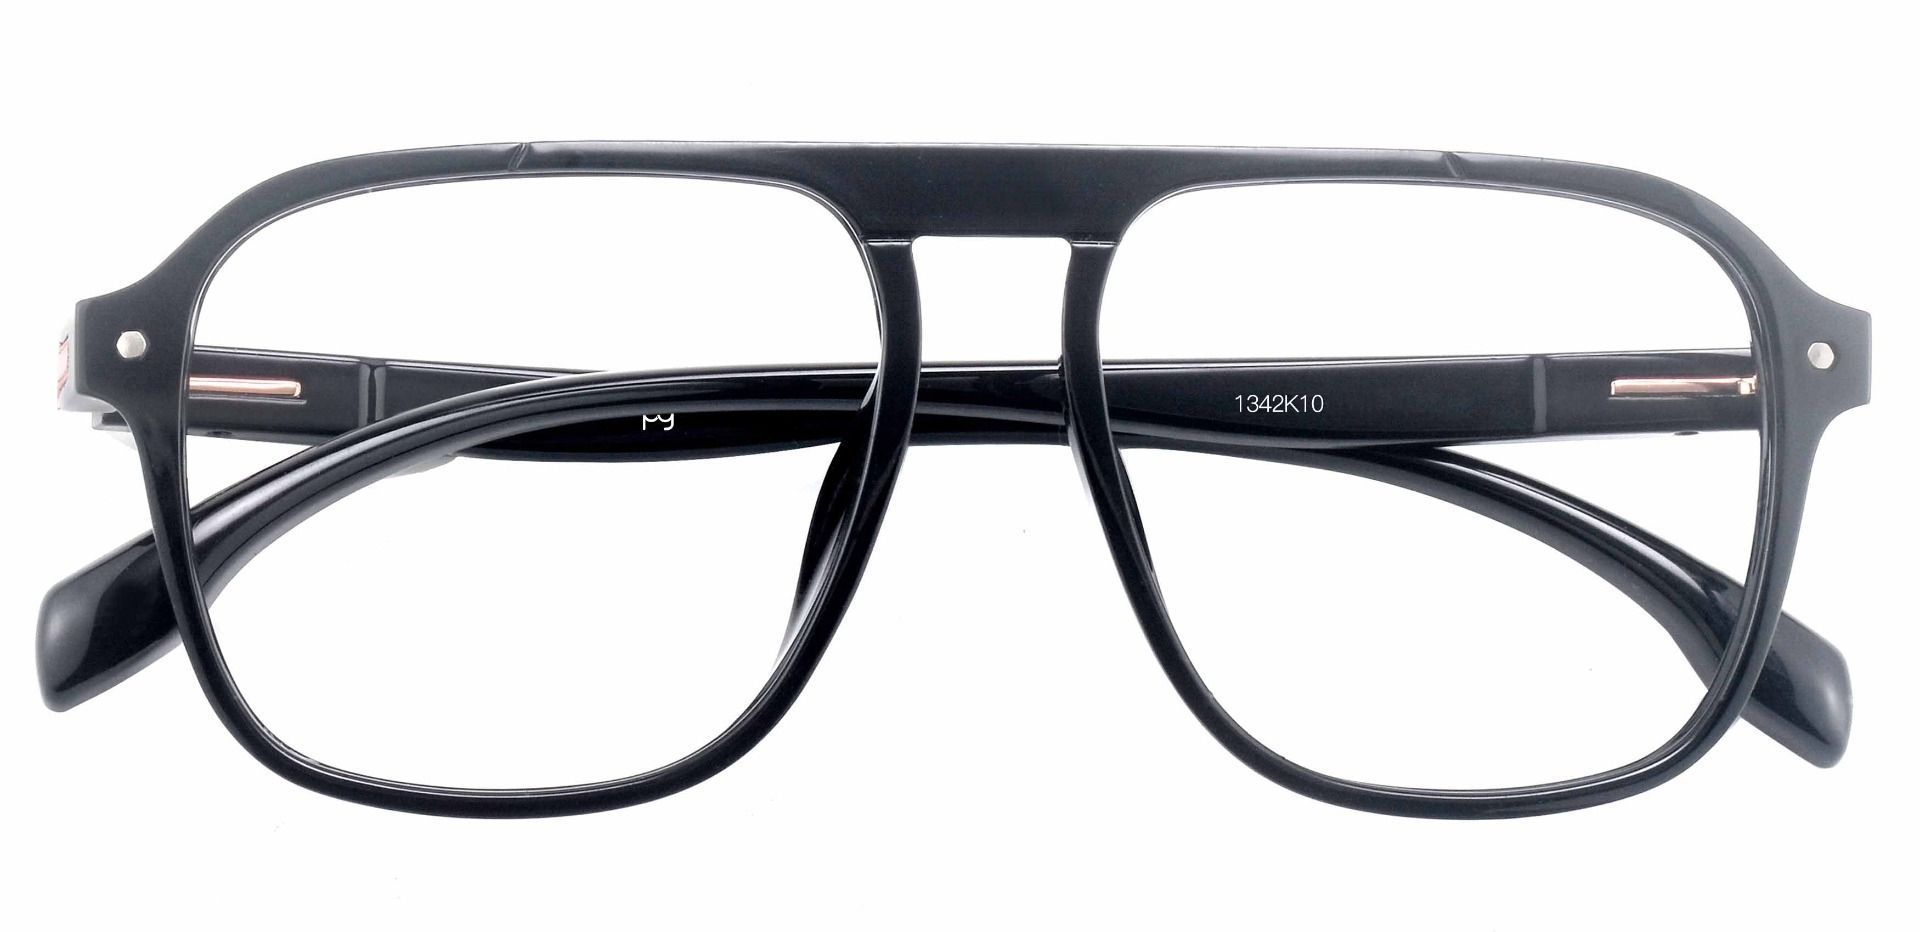 Gideon Aviator Prescription Glasses - Black